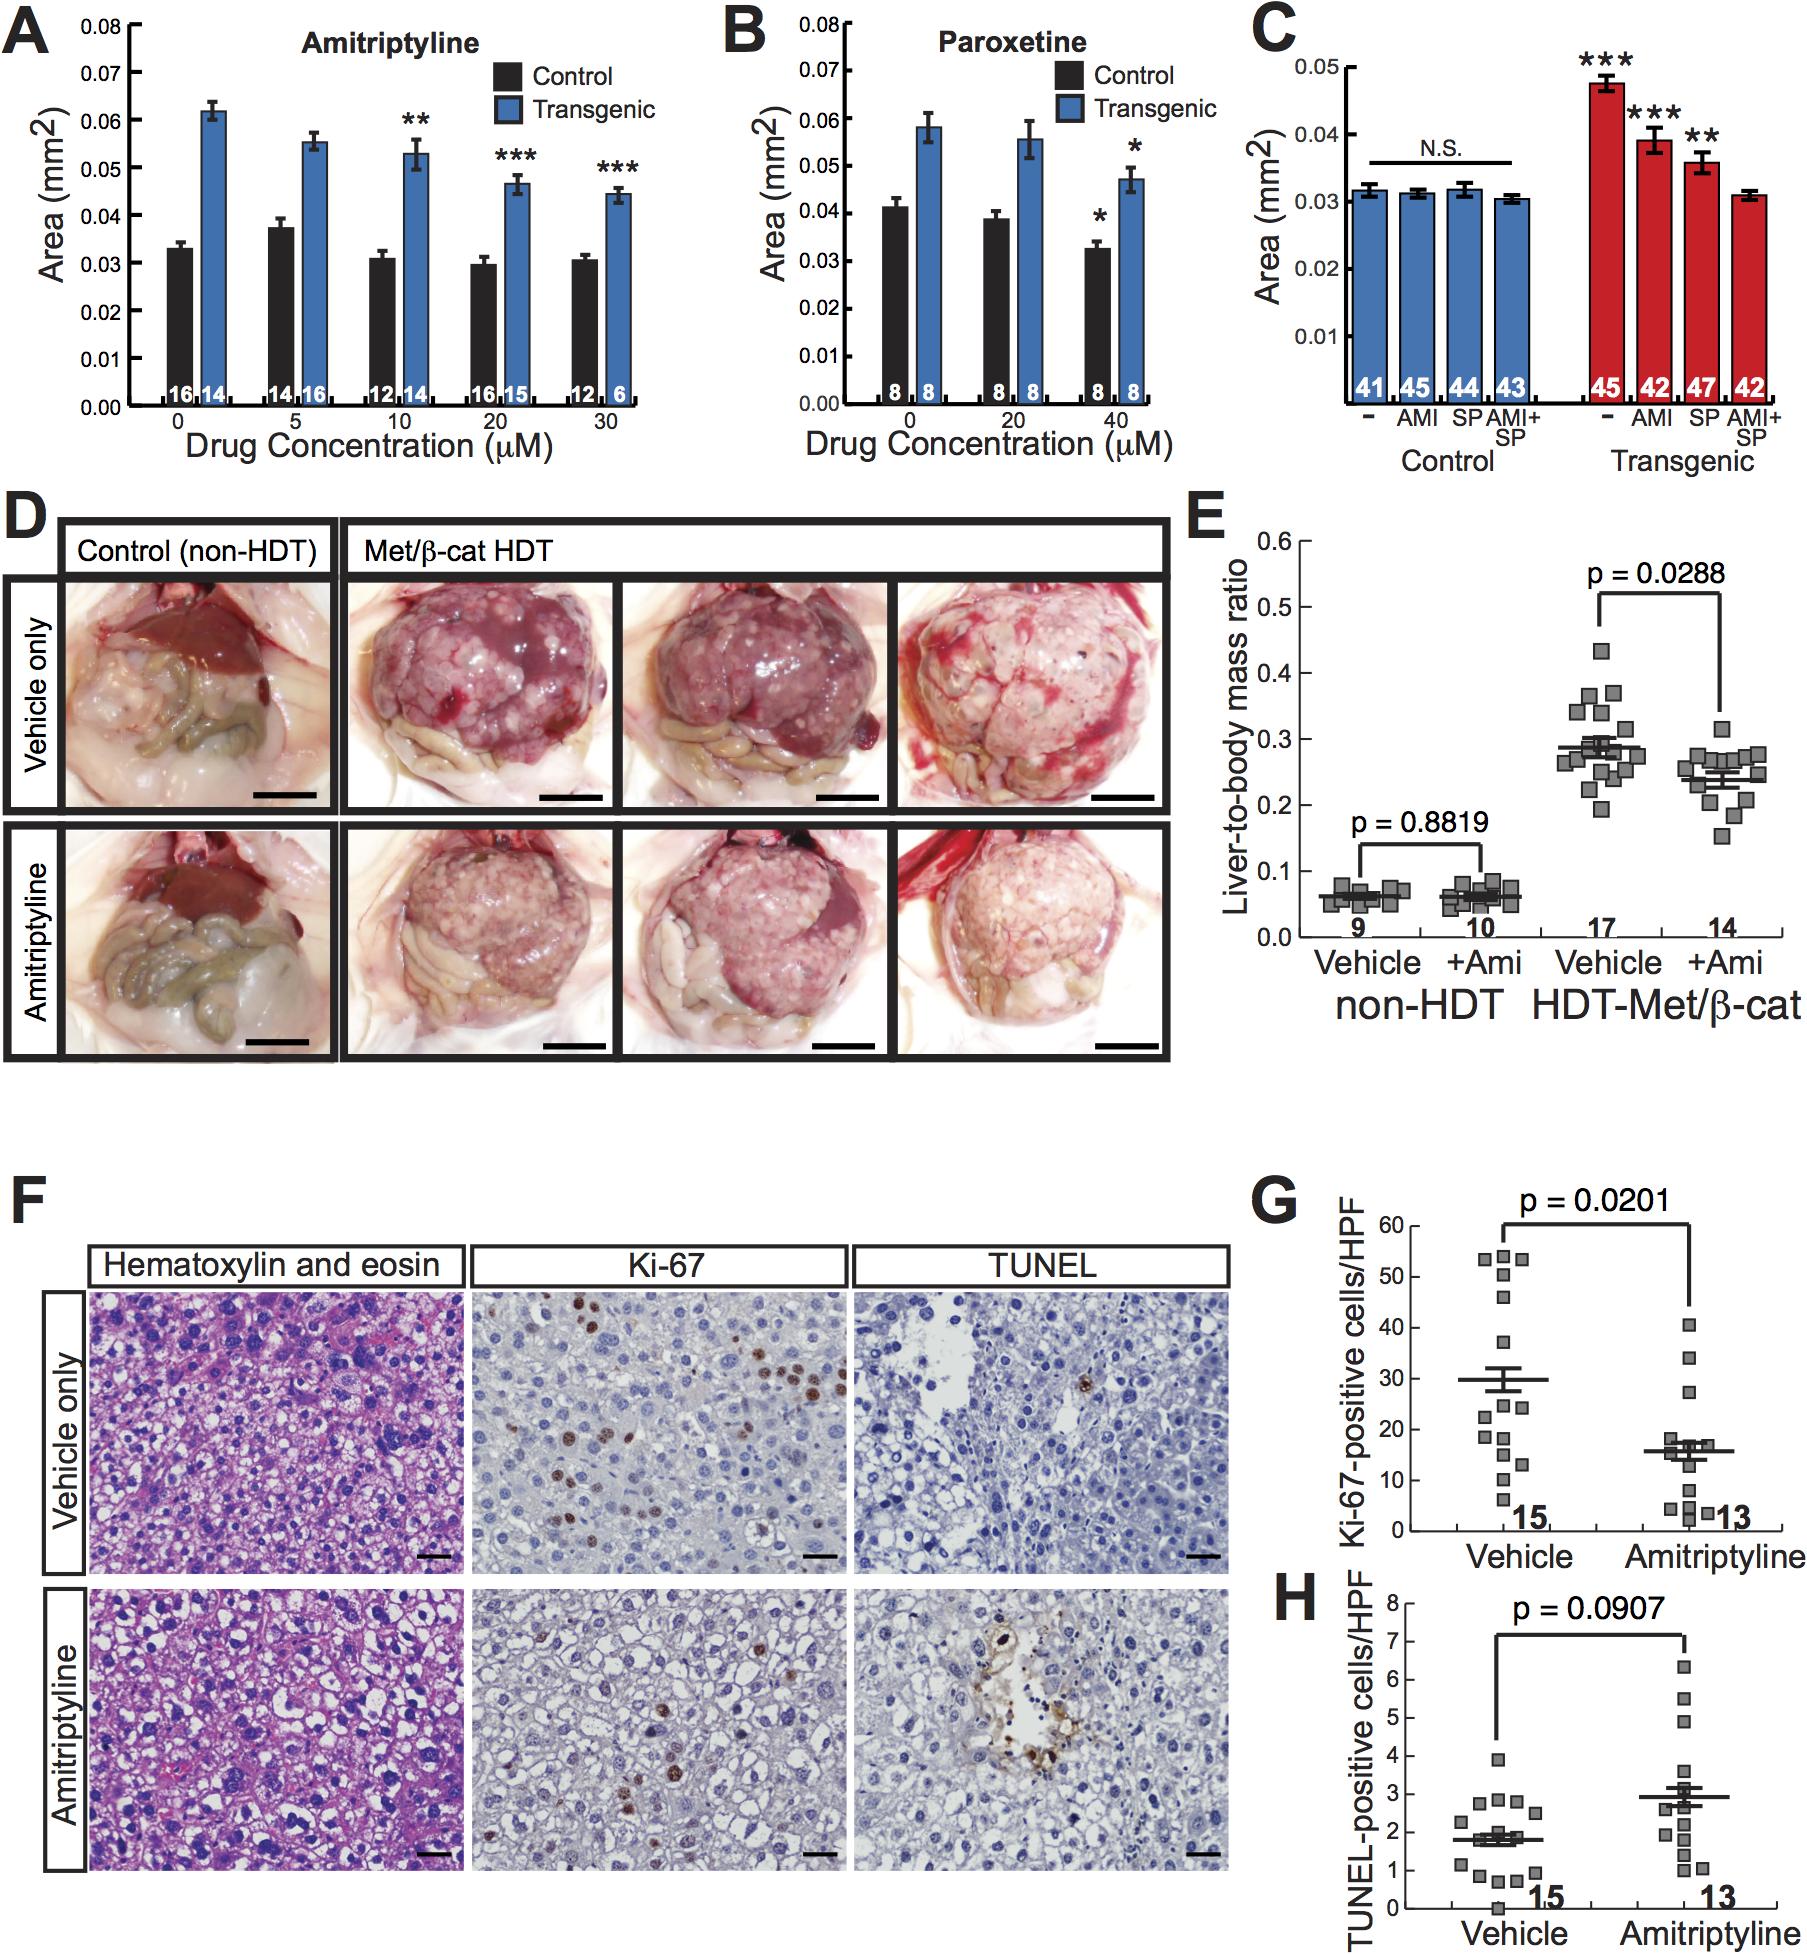 Antidepressants decrease β-catenin-induced liver enlargement and tumorigenesis.